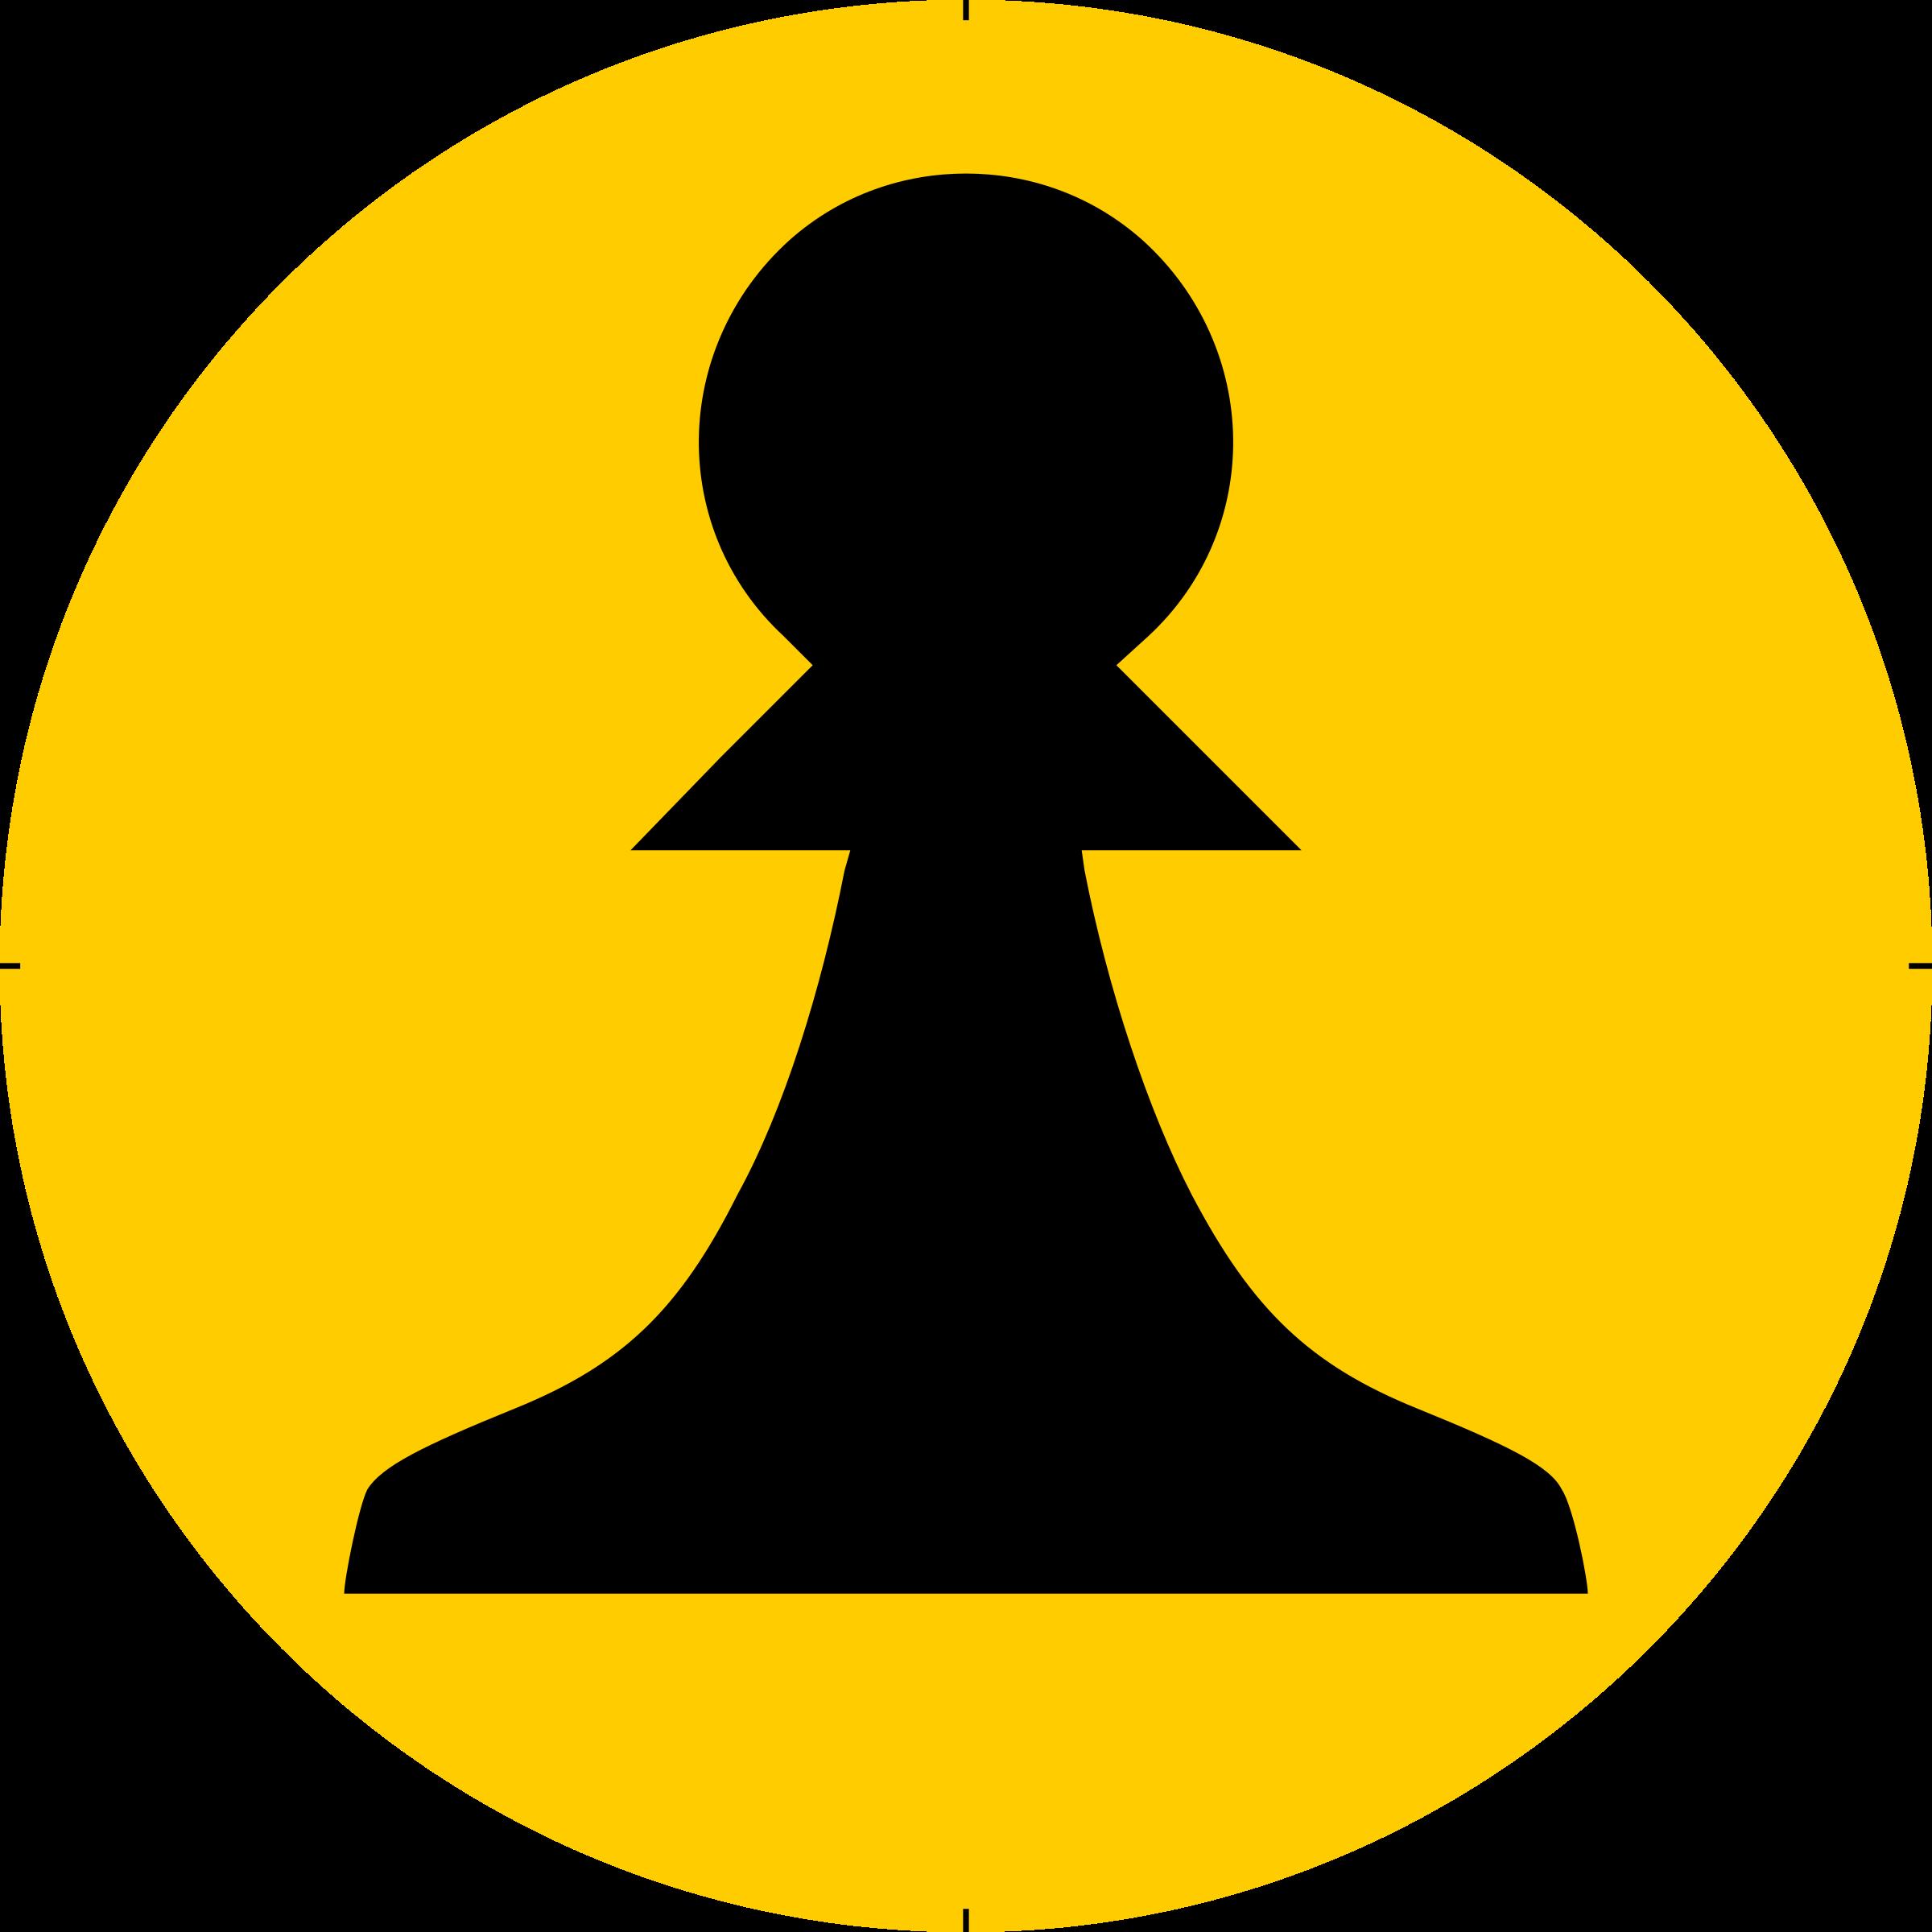 Chess piece symbol black. Writer clipart peon